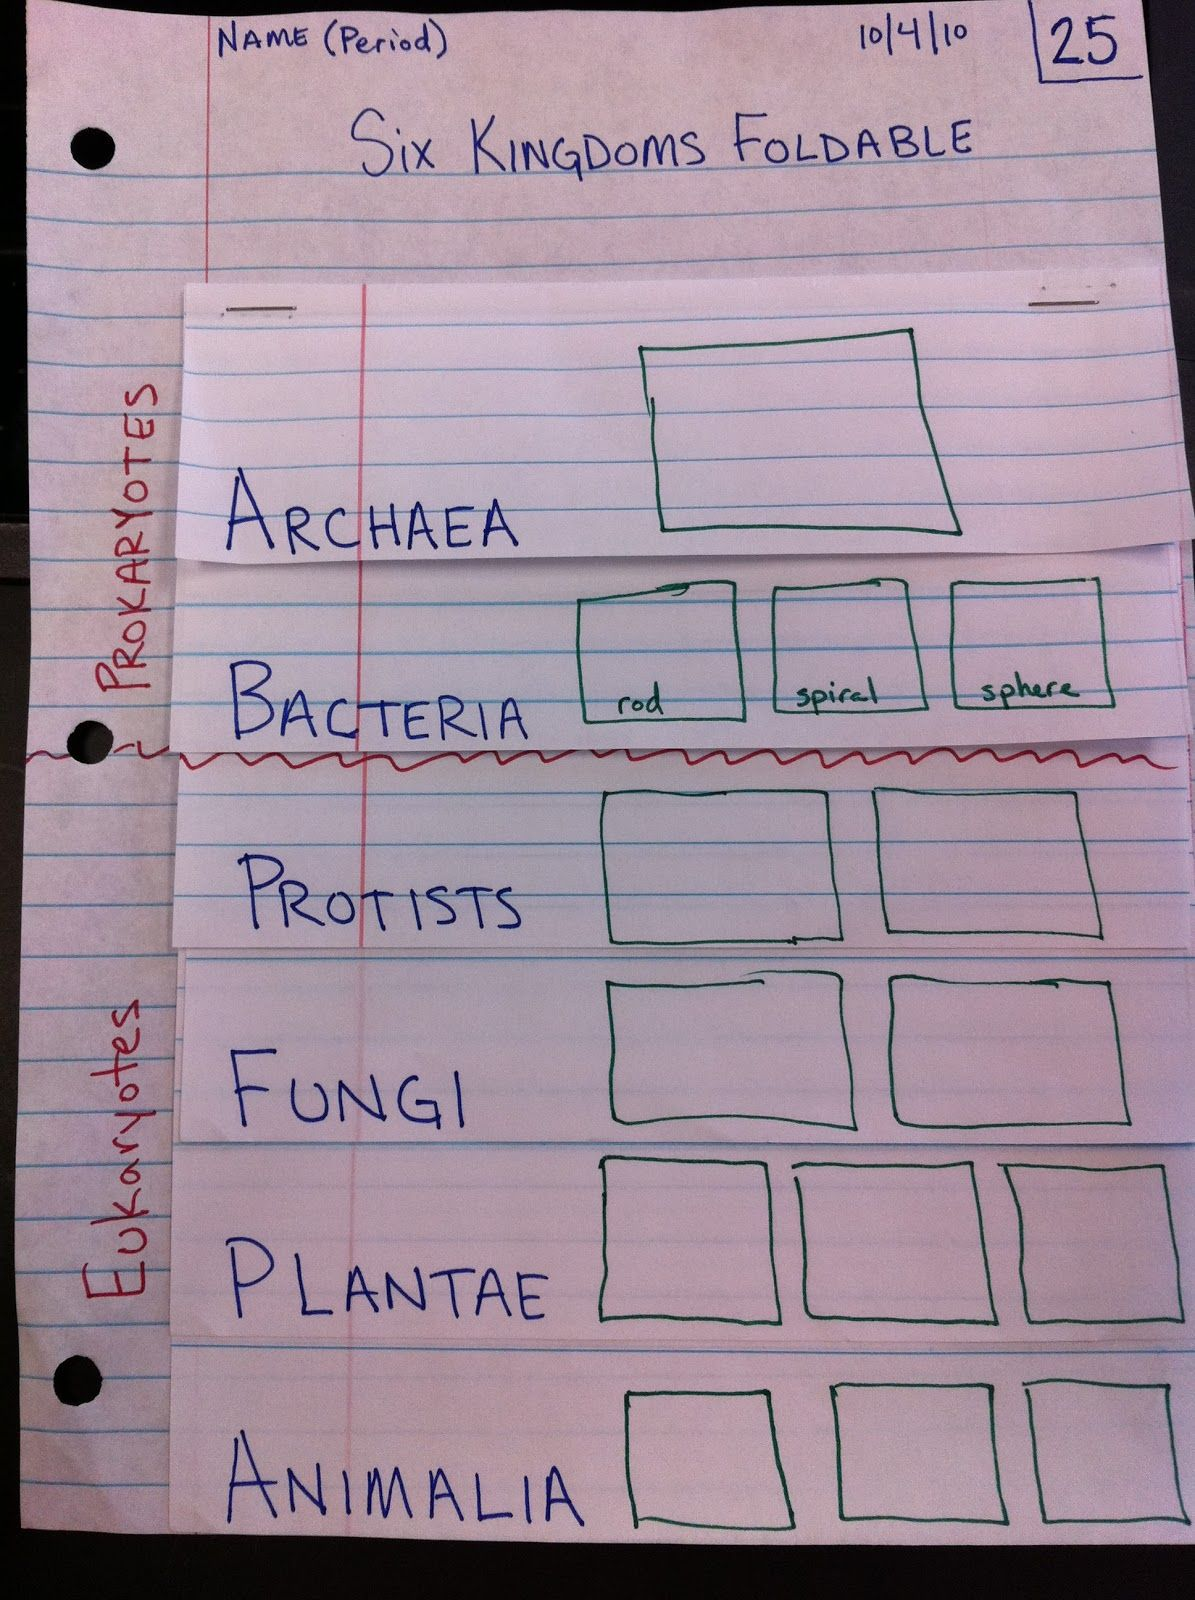 Garner 6th Grade Science Blog Six Kingdoms Foldable With